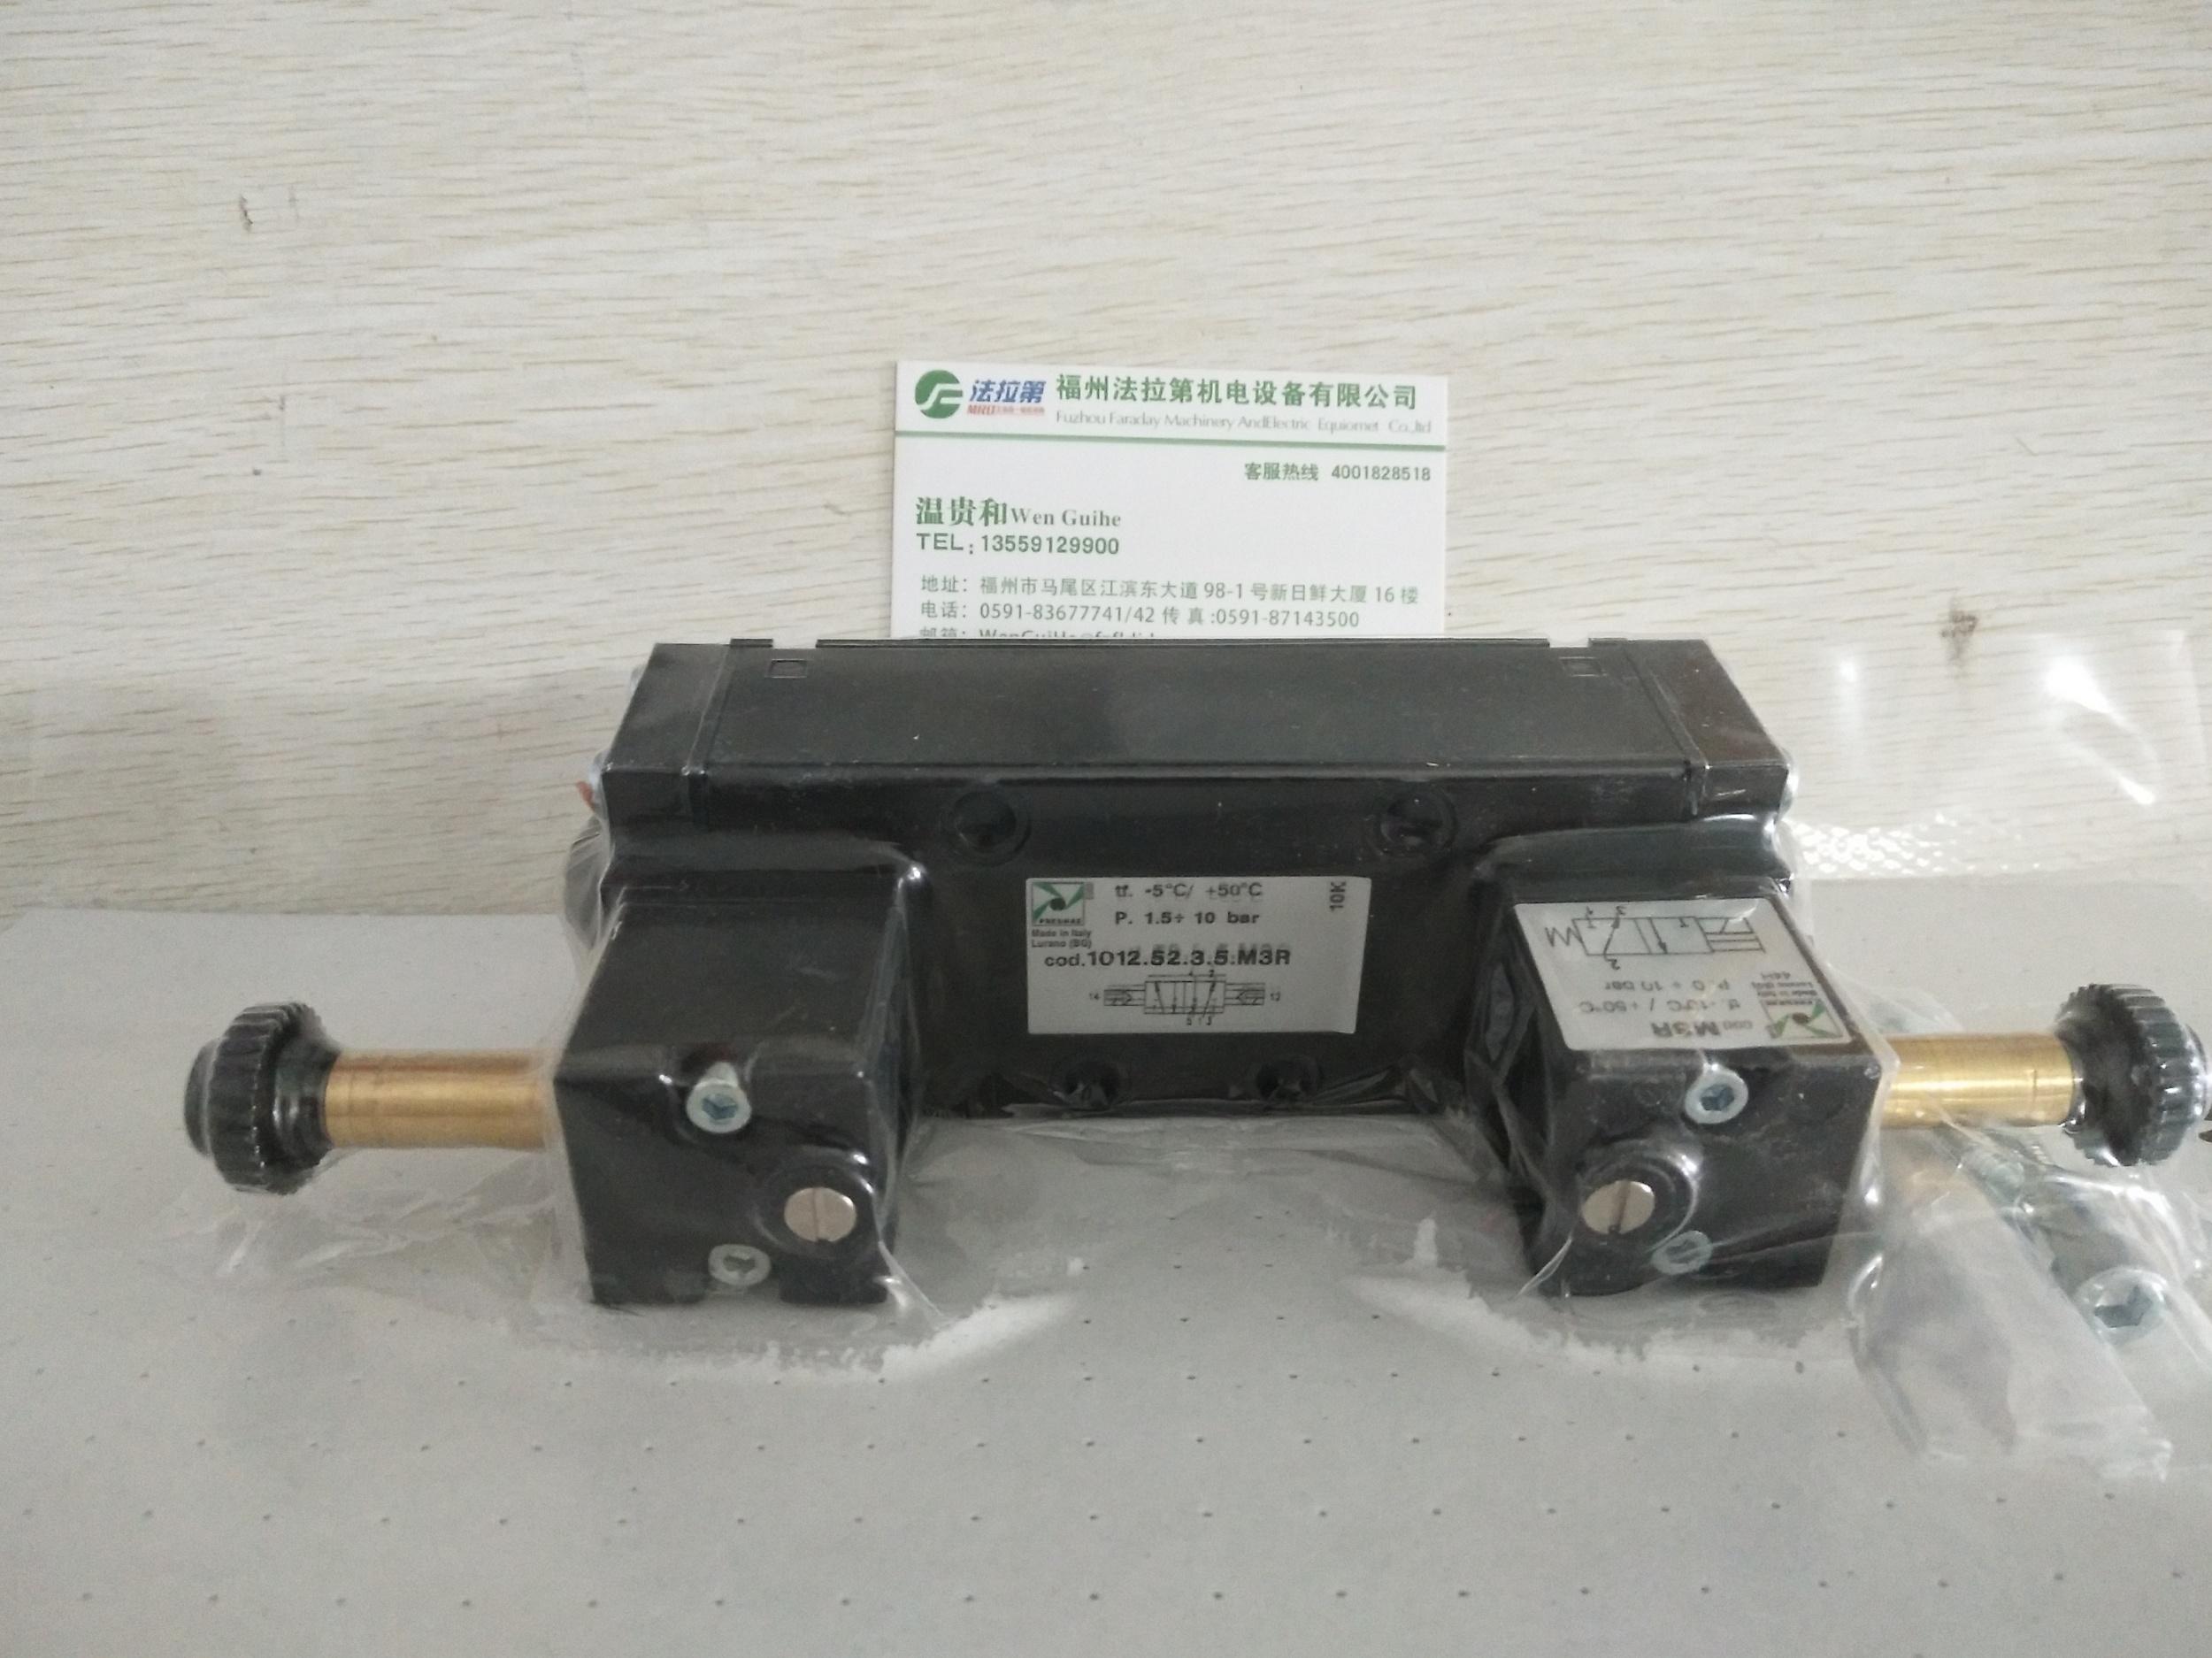 PNEUMAX电磁阀1012.52.3.5.M3R 2021年6月上旬到货